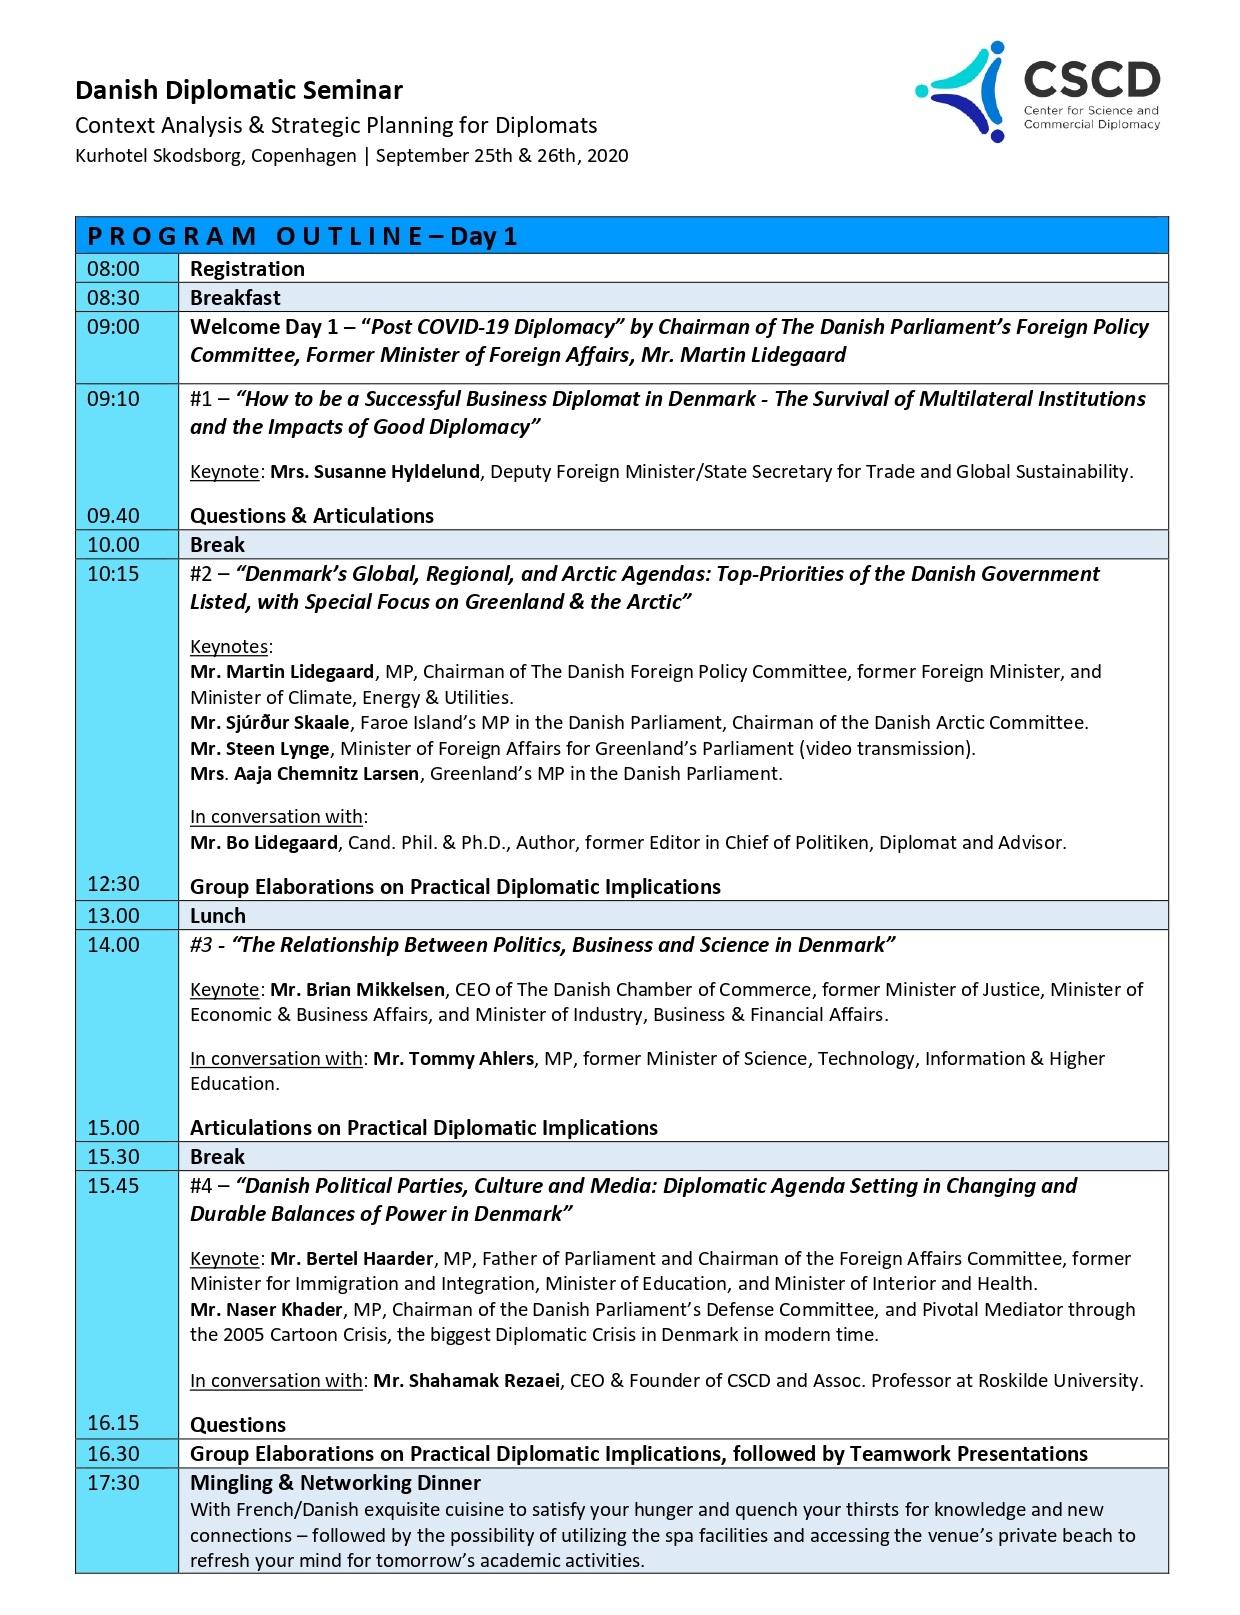 Program Danish Diplomatic Seminar